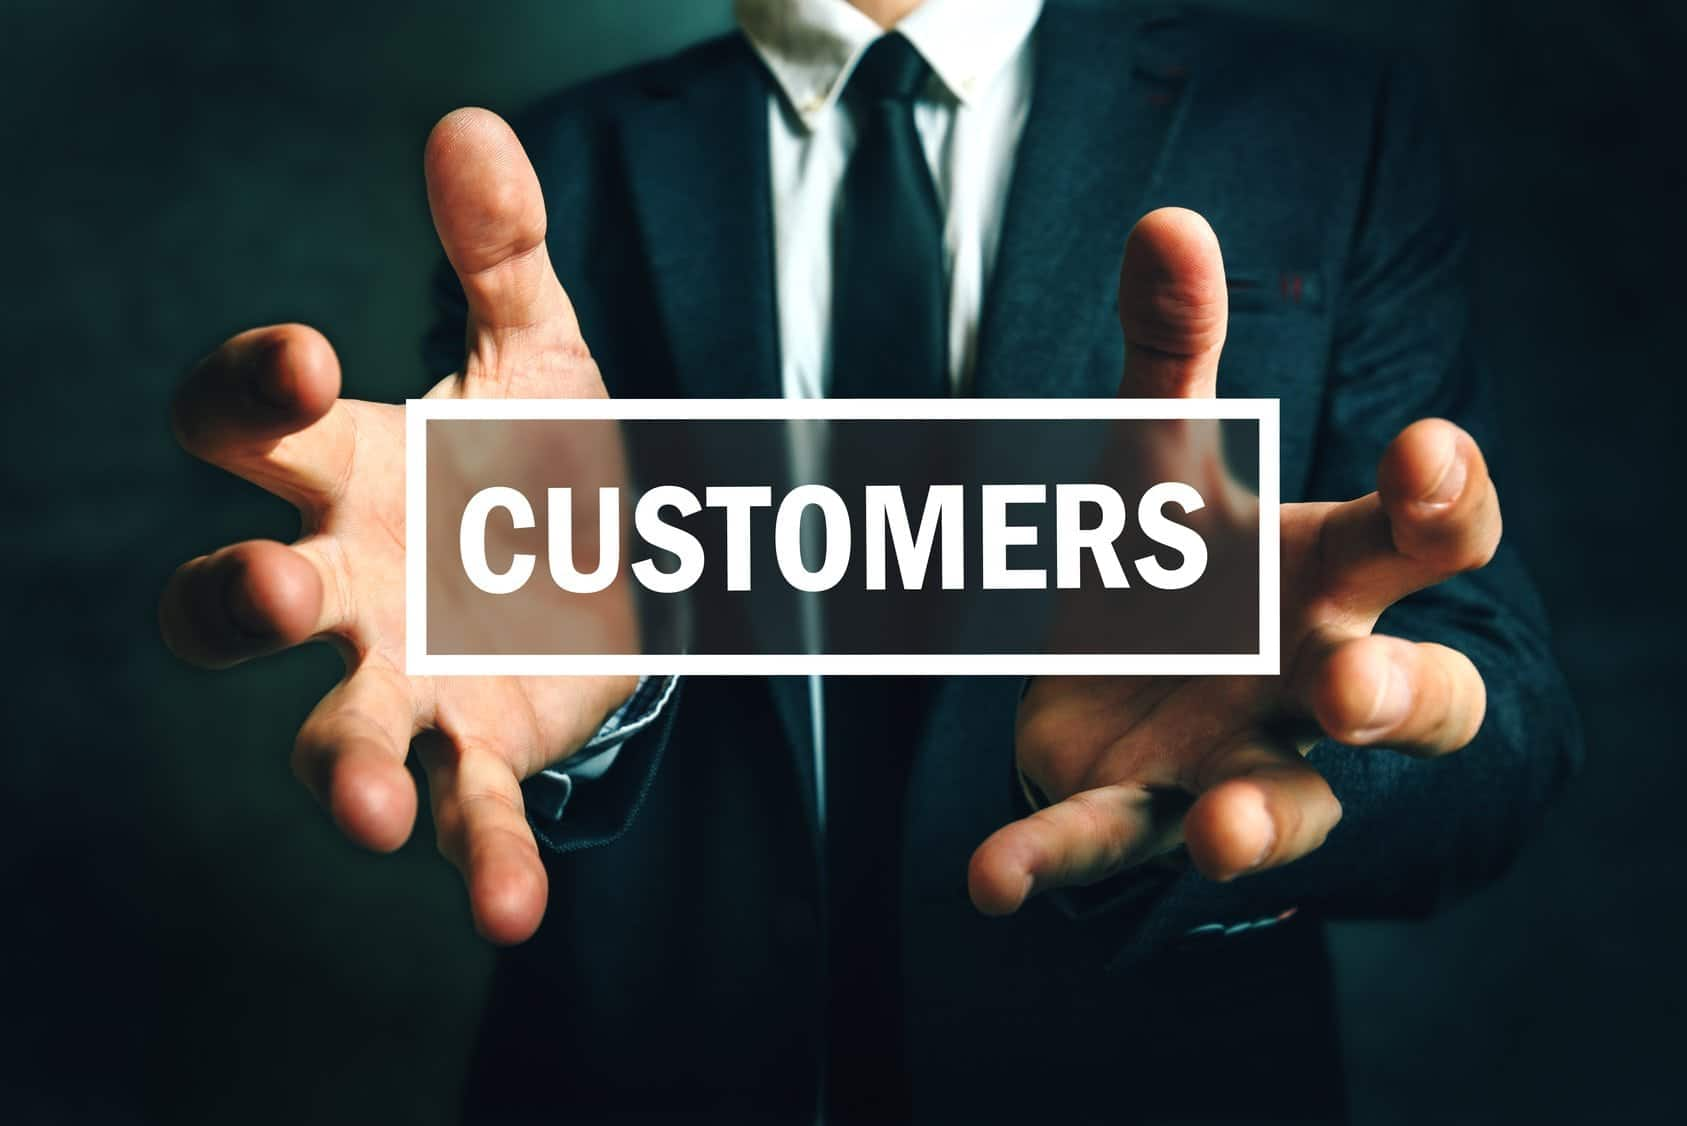 customer adalah